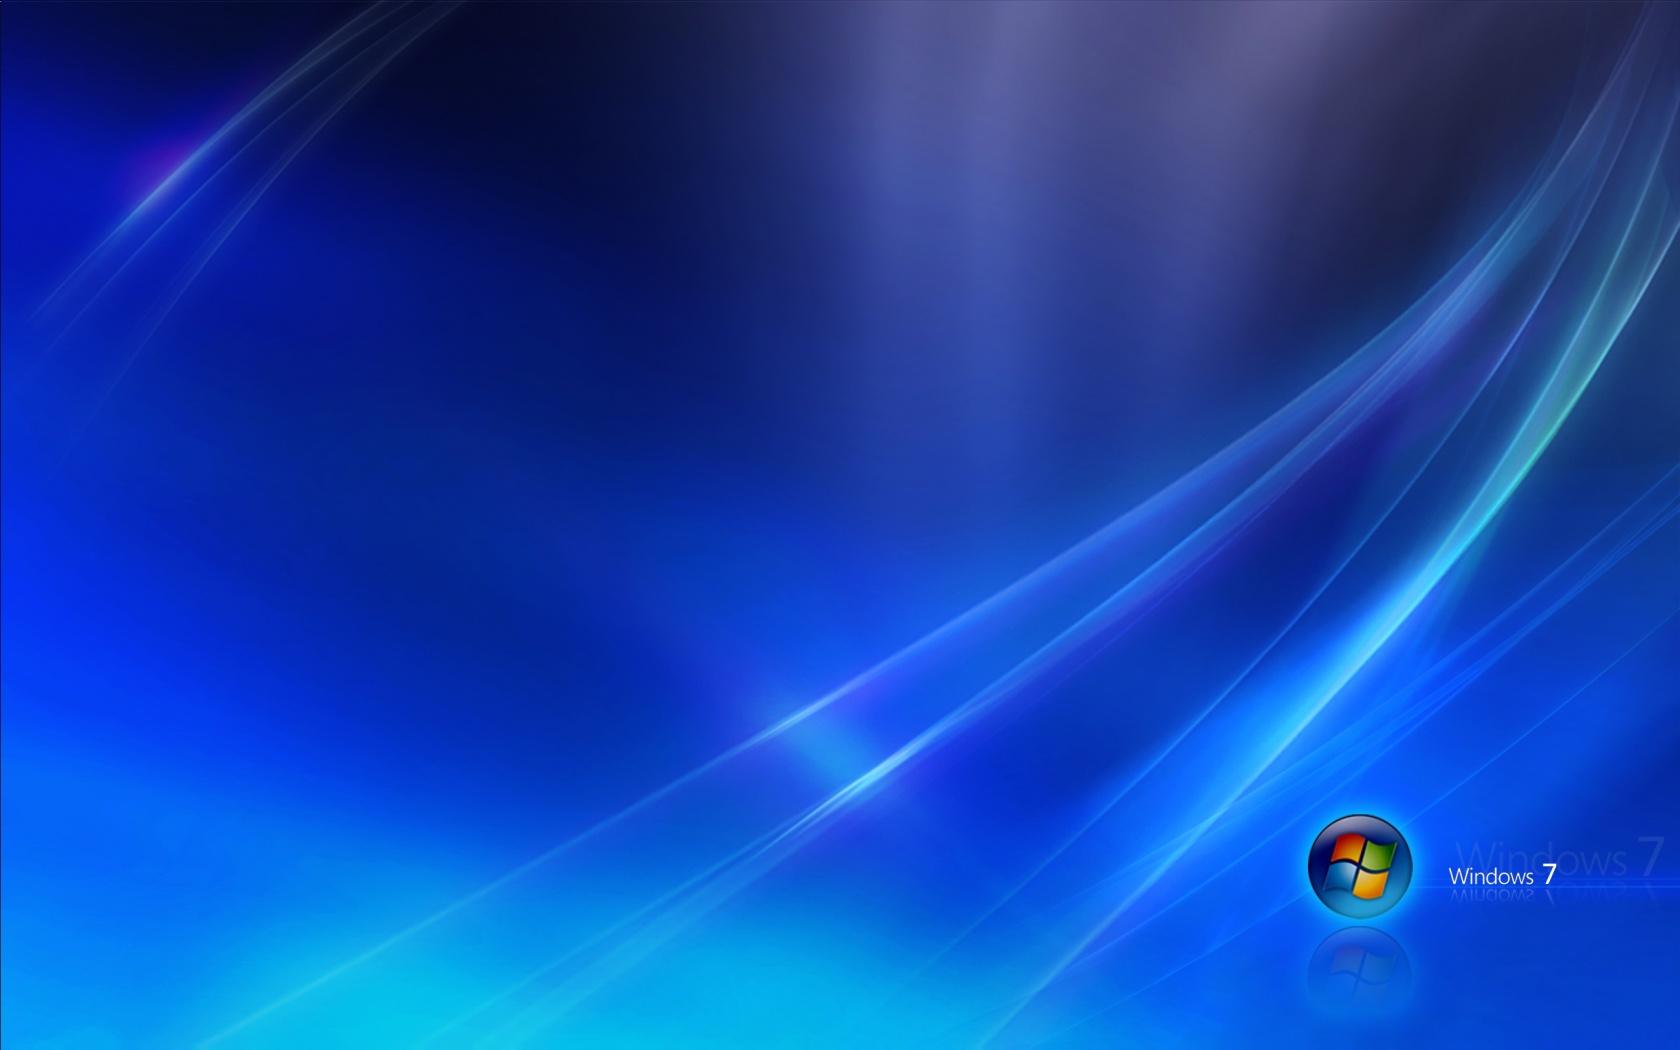 Windows 7 Blue Dark Wallpapers